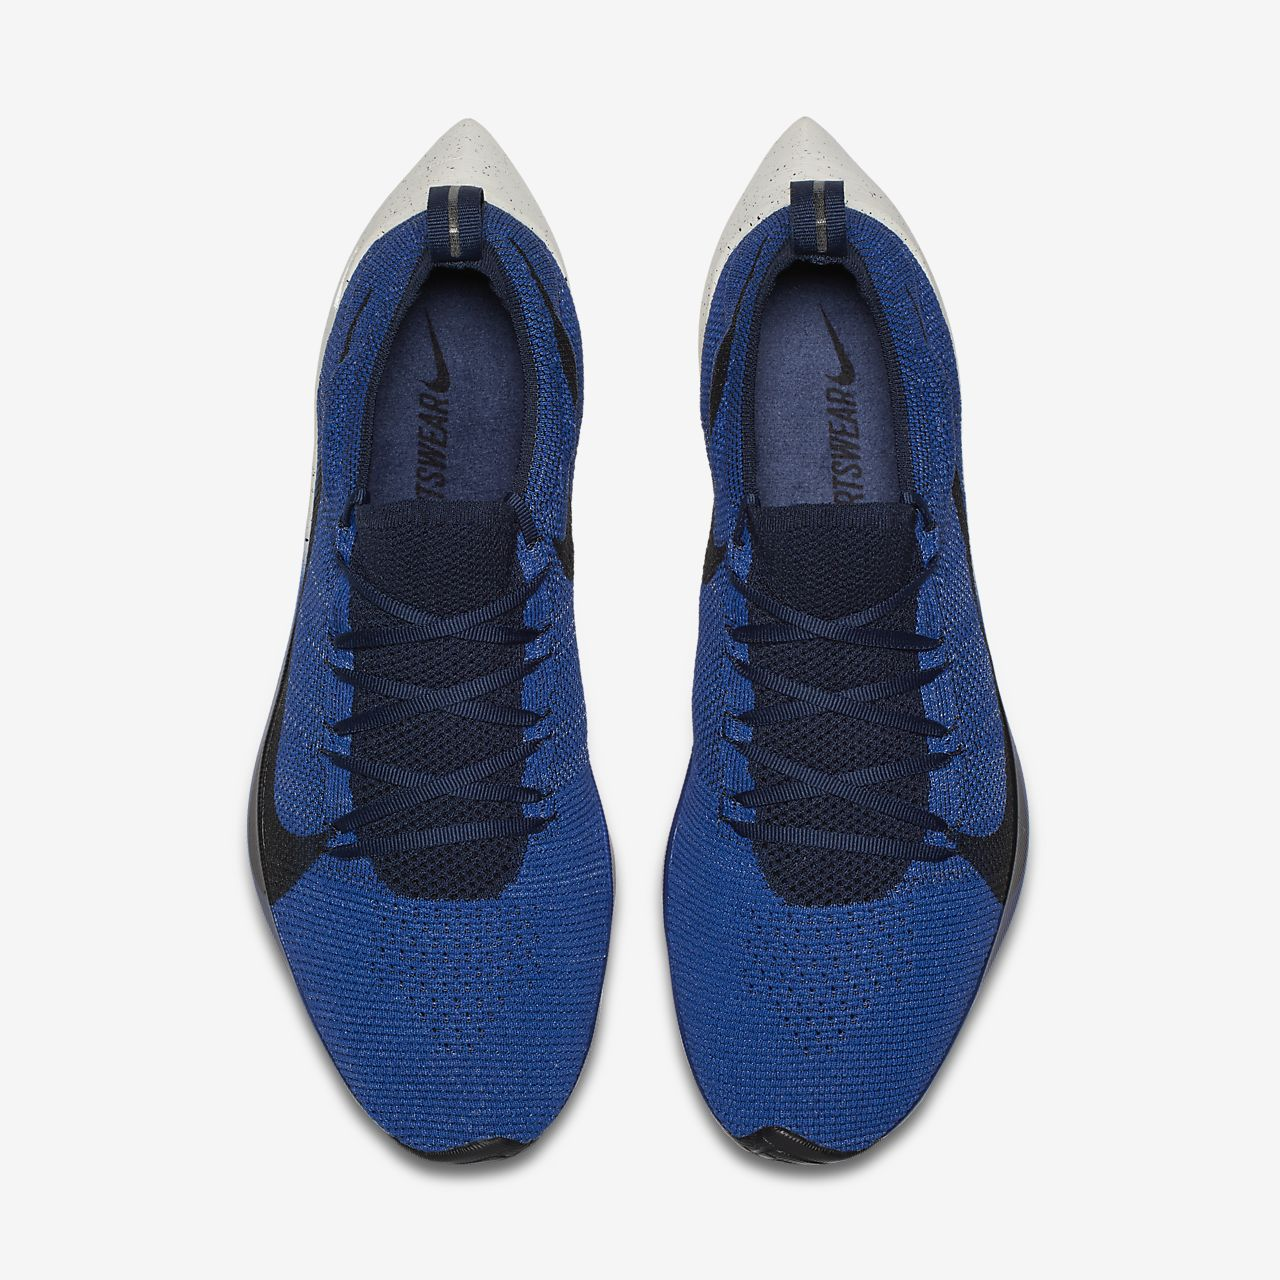 8808284315402 Nike React Vapor Street Flyknit Men s Shoe. Nike.com NZ